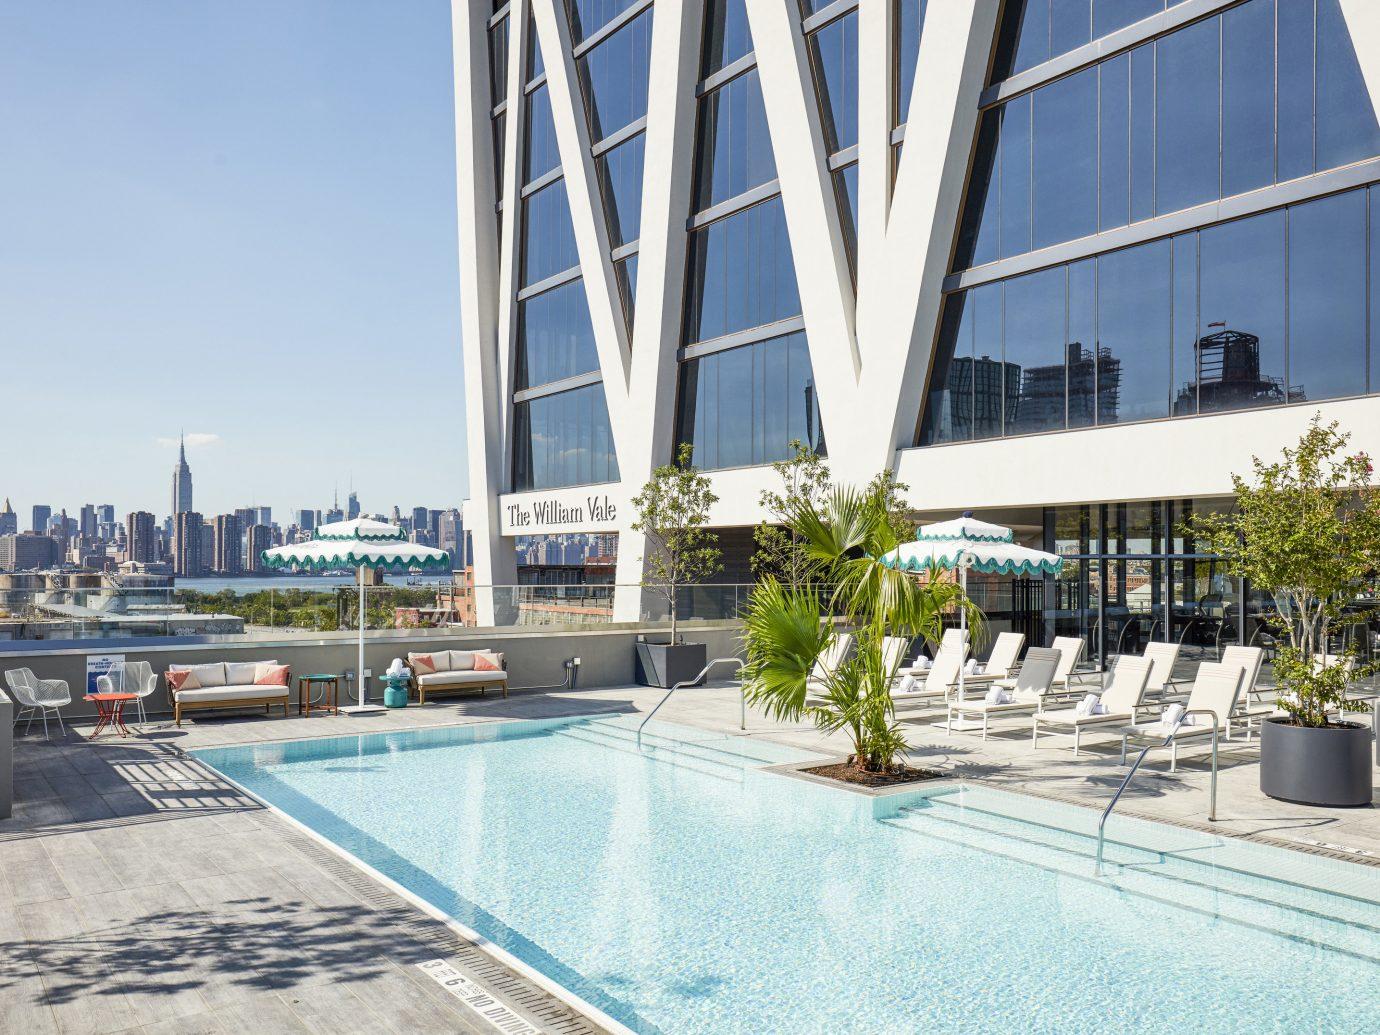 Hotels sky outdoor building leisure property swimming pool condominium plaza Architecture facade estate Resort headquarters apartment